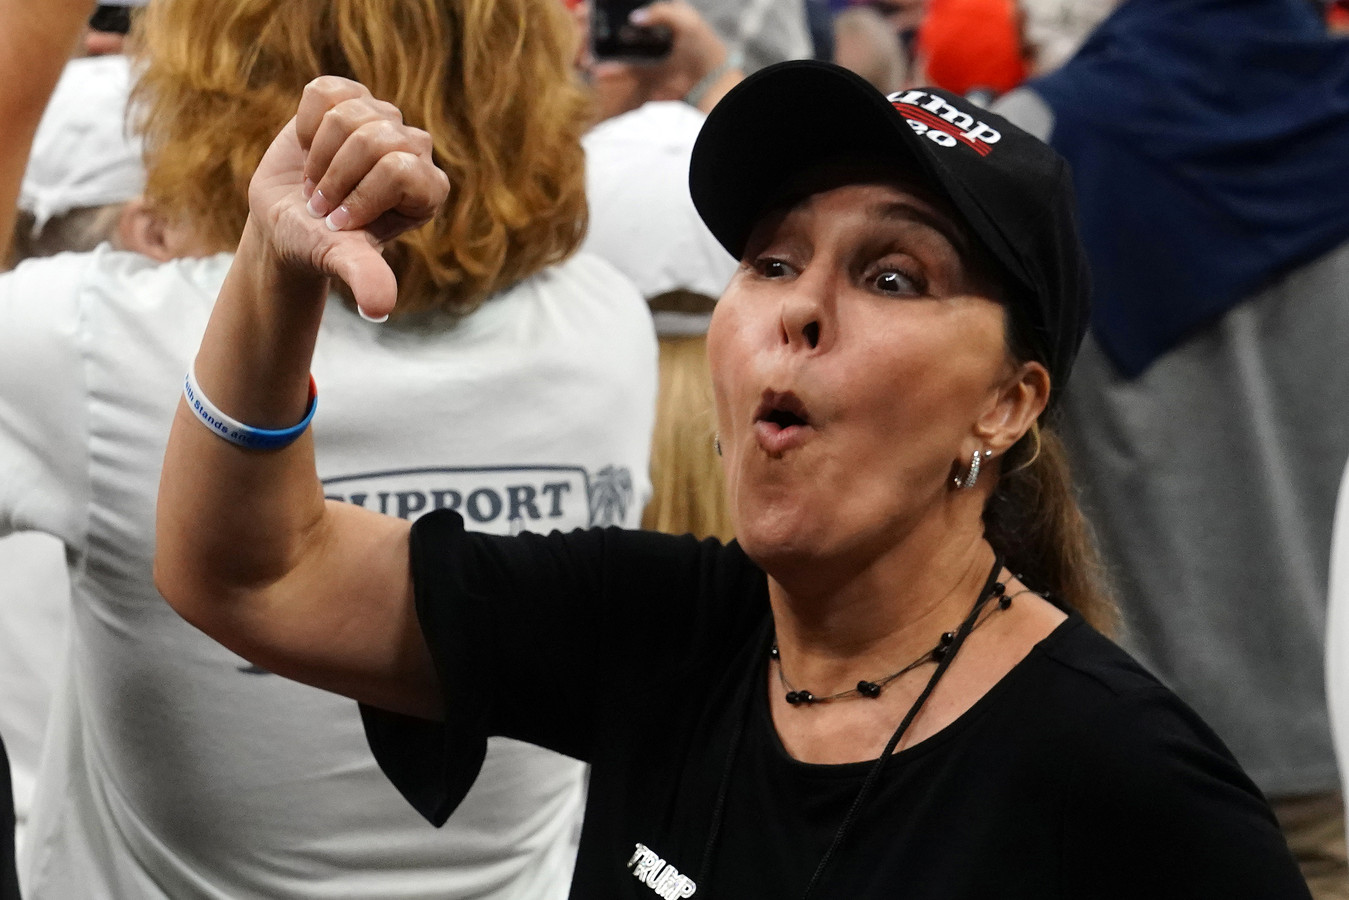 Une supportrice de Trump à Orlando mardi soir.